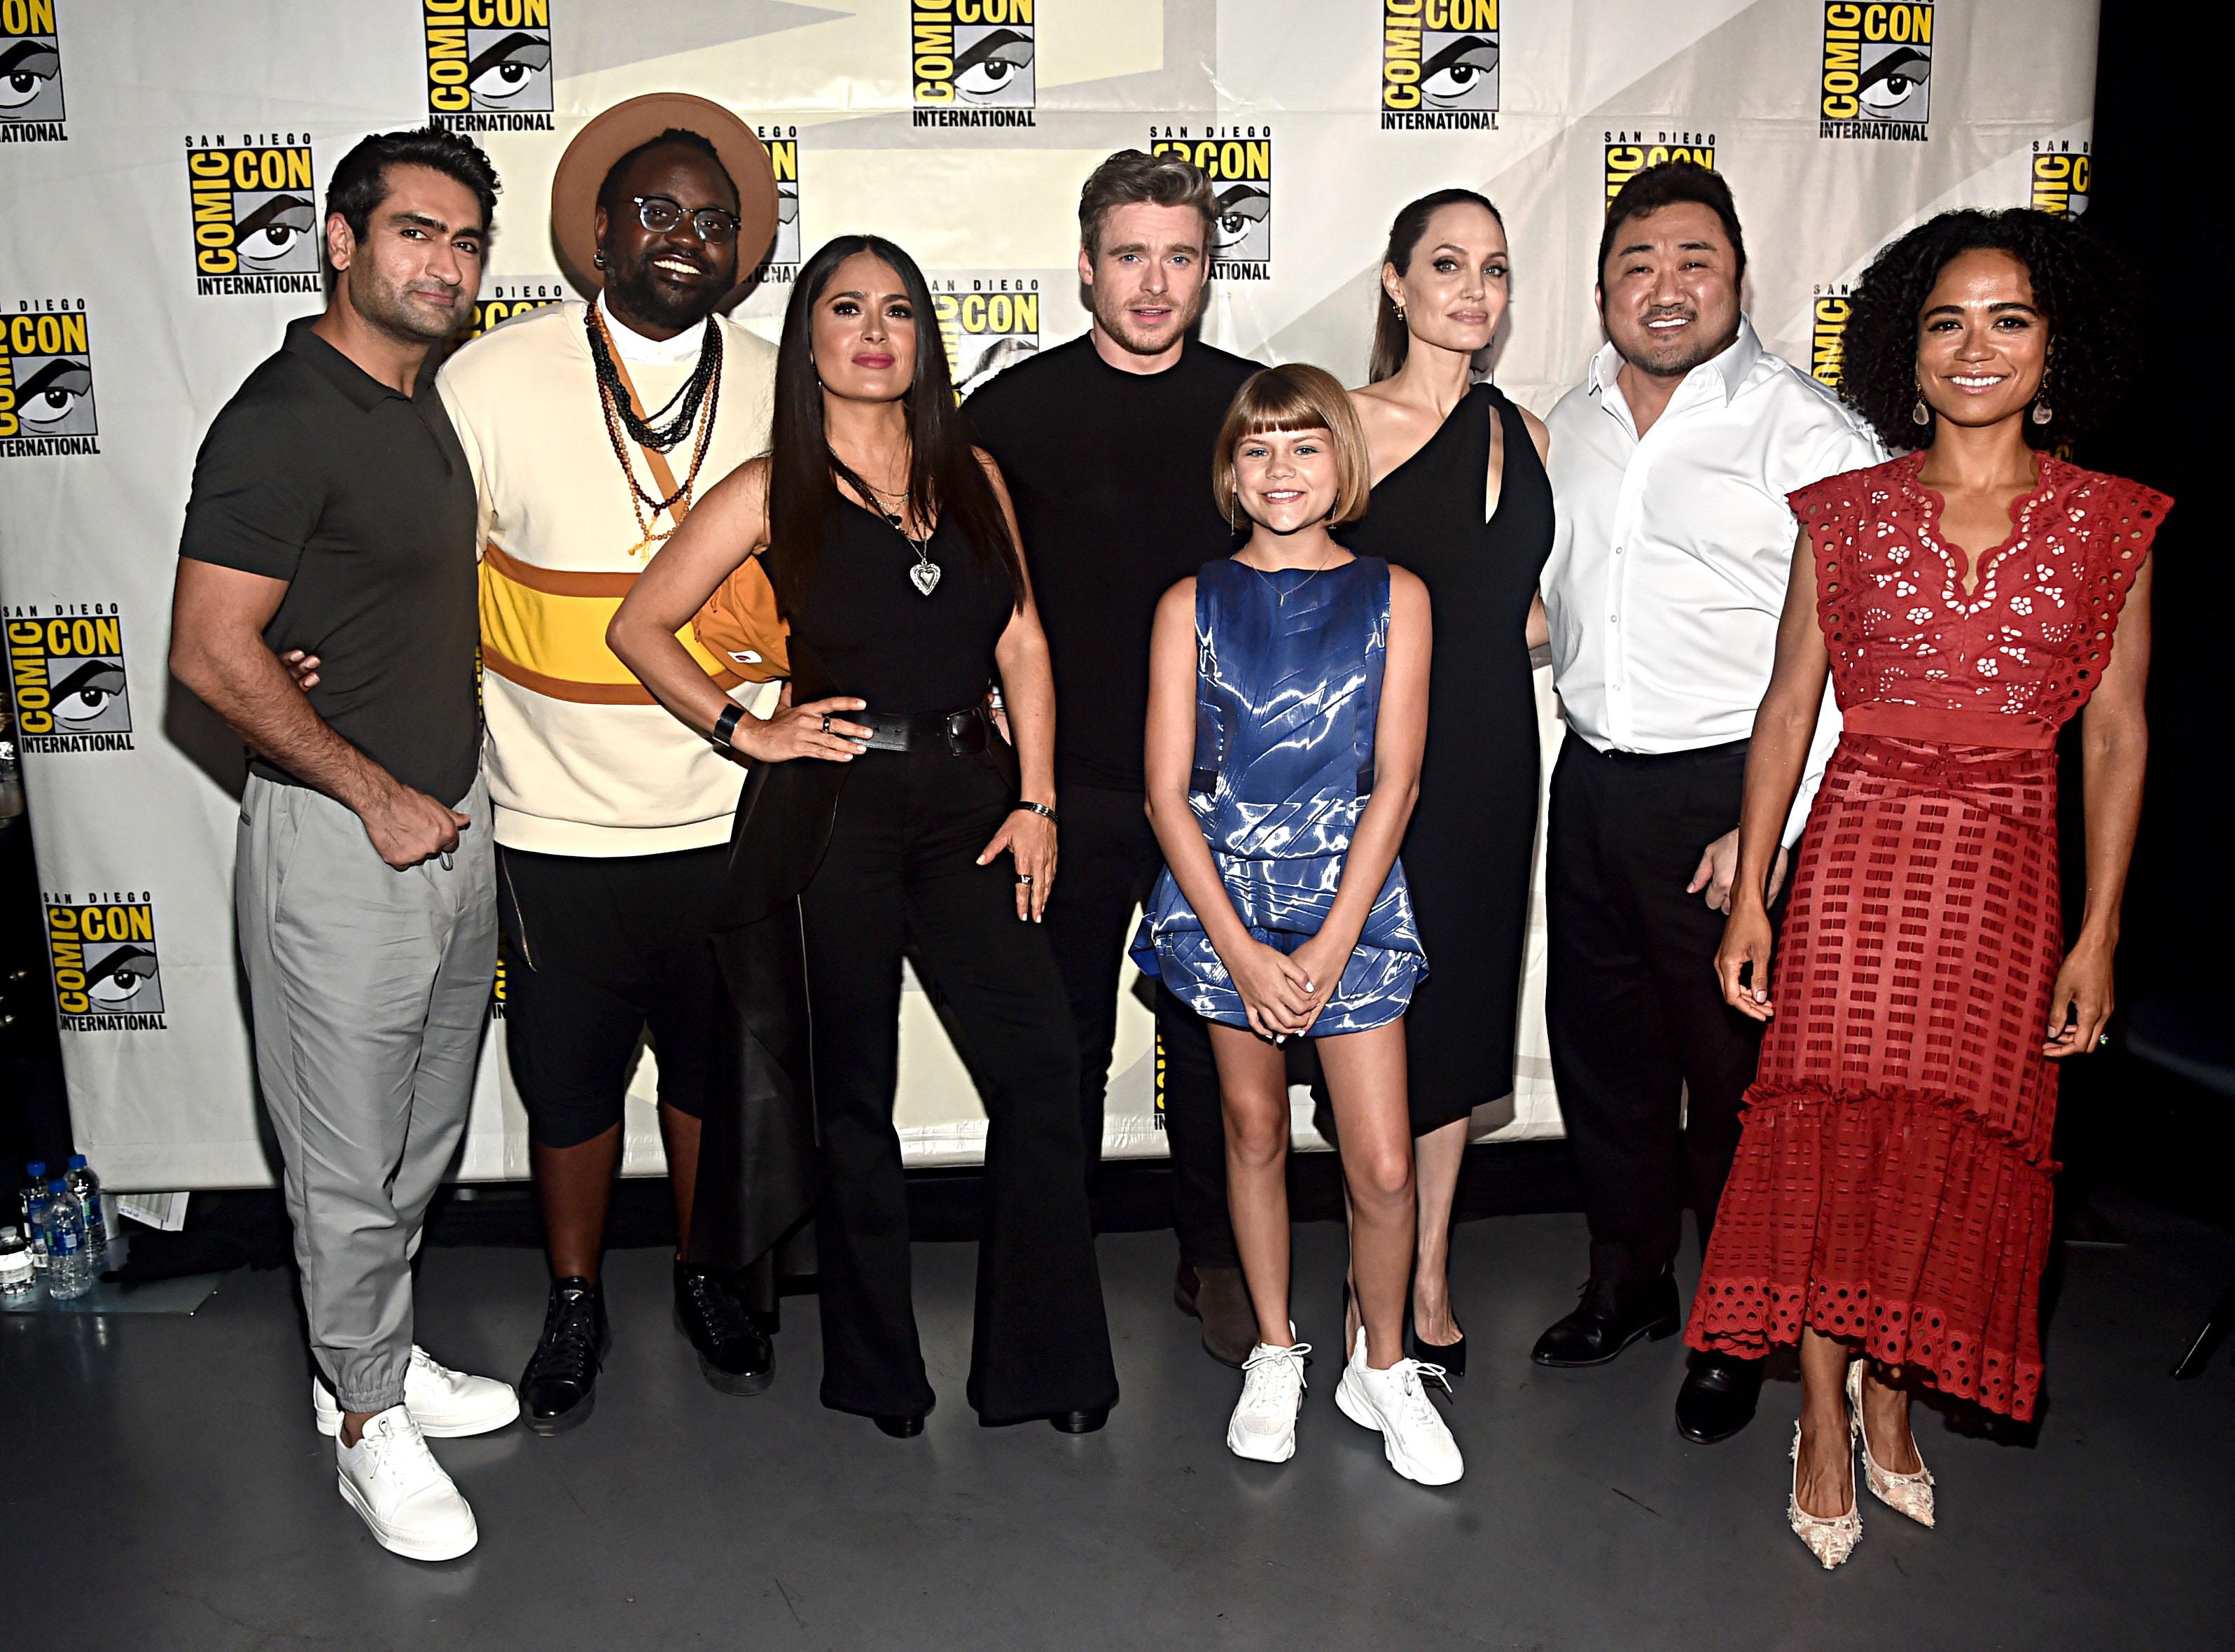 (L-R) Kumail Nanjiani, Brian Tyree Henry, Salma Hayek, Richard Madden, Lia McHugh, Angelina Jolie, Don Lee and Lauren Ridloff of Marvel Studios' 'The Eternals' at the San Diego Comic-Con in 2019.